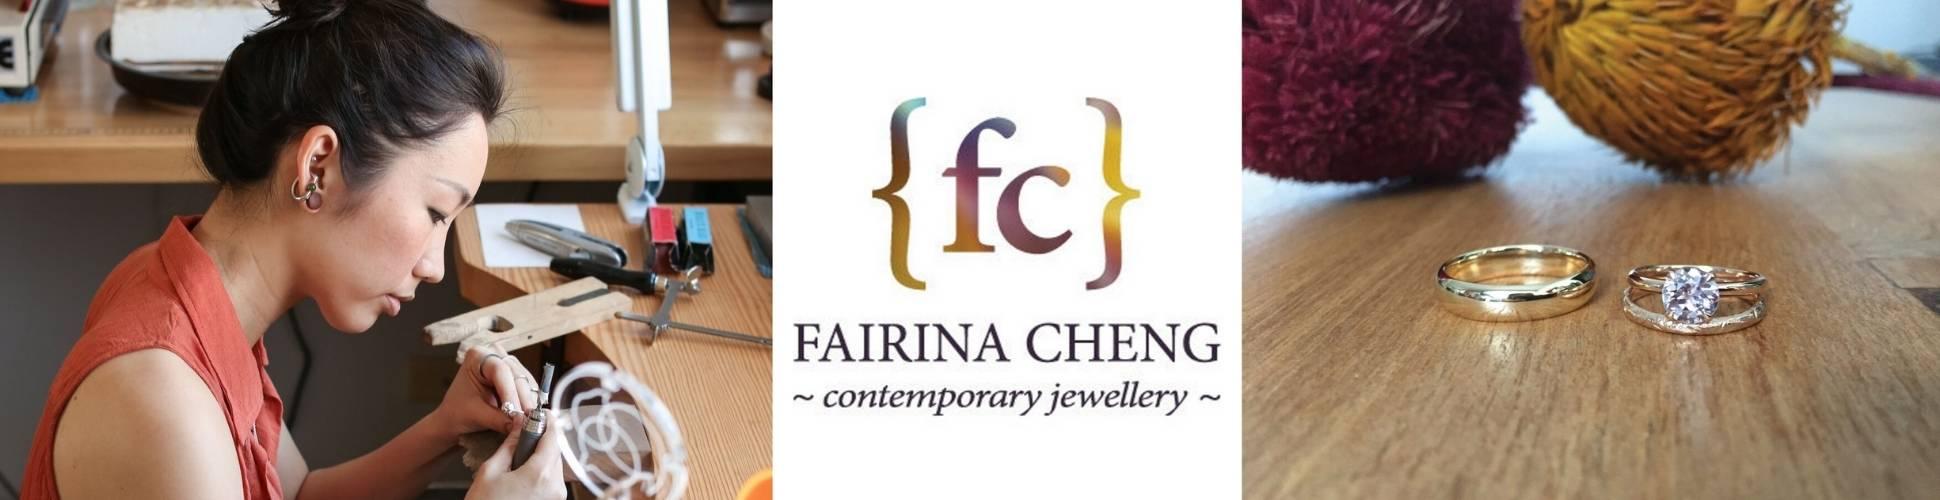 Fairina Cheng Jewellery Same-Sex-Wedding-Directory-Dancing-With-Her-Lesbian-Wedding